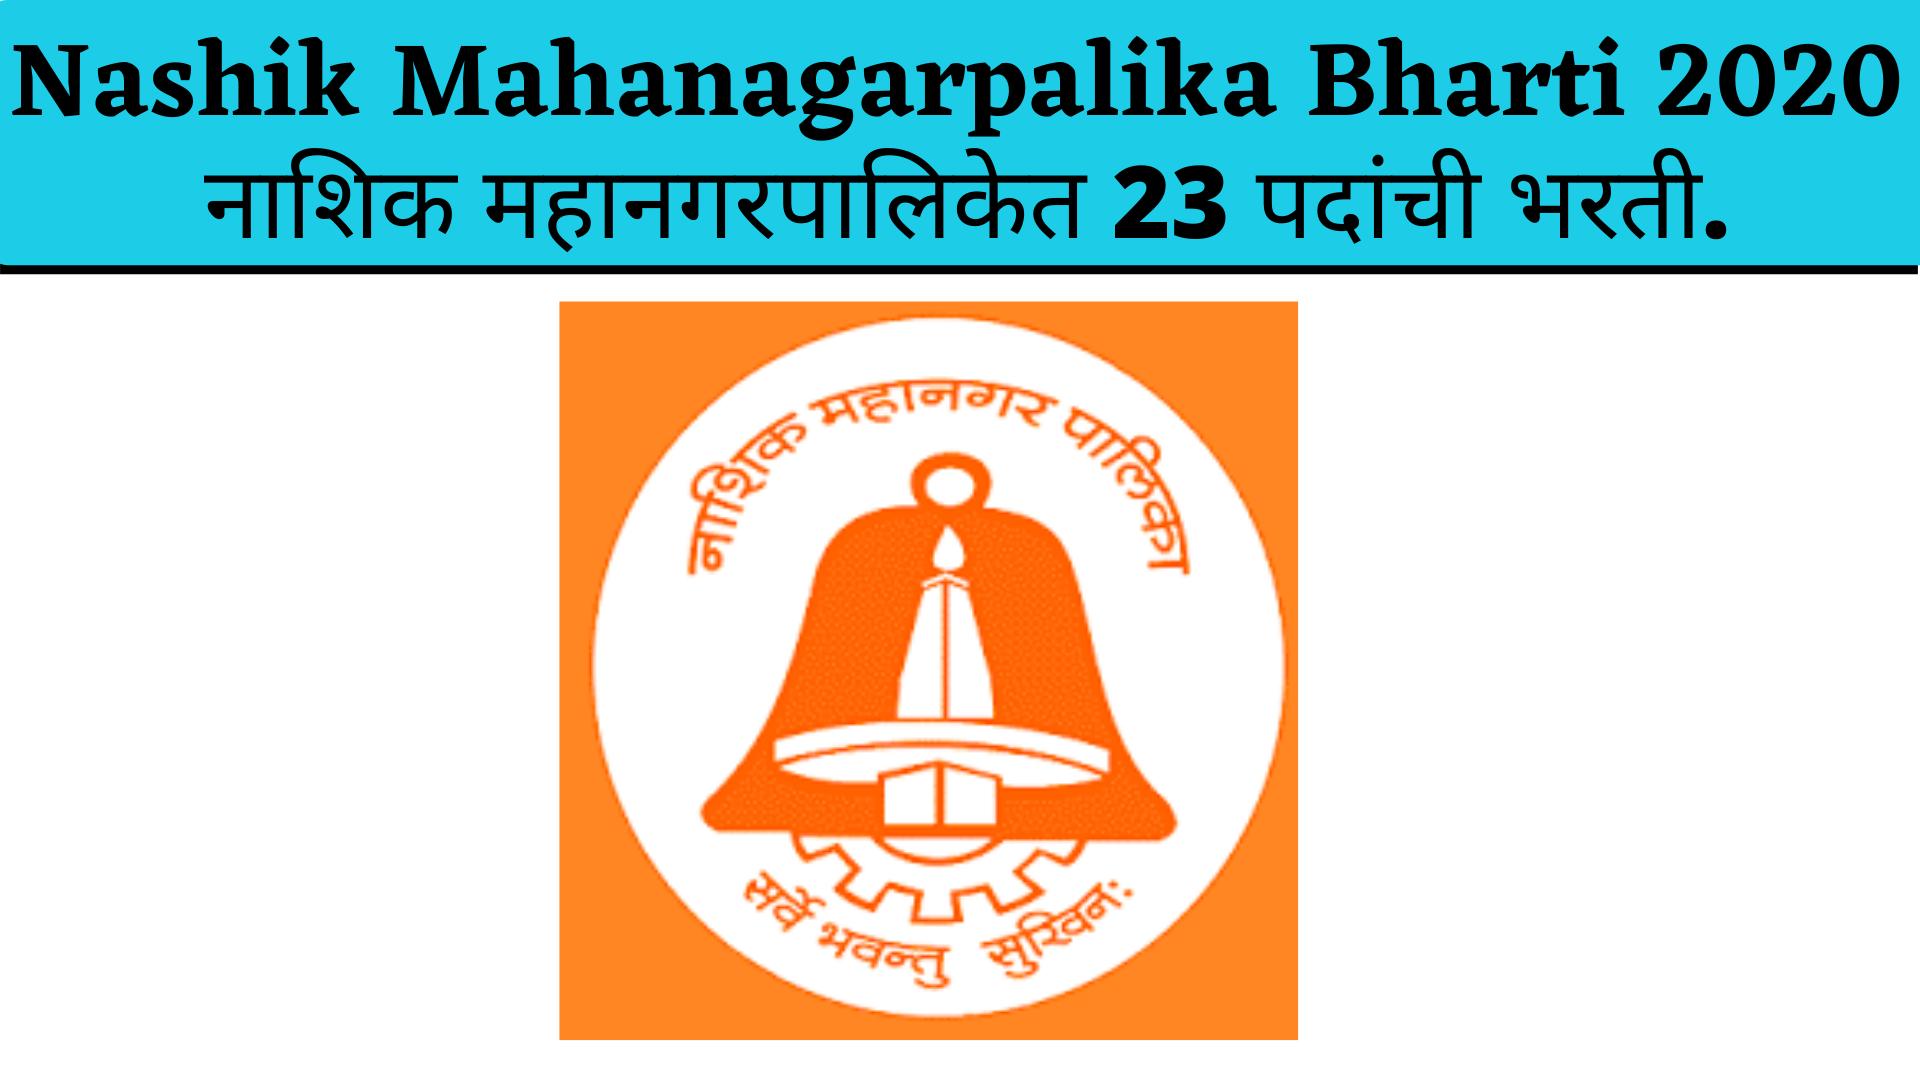 Nashik Mahanagar Palika Bharti 2020 | NMC Recruitment 2020